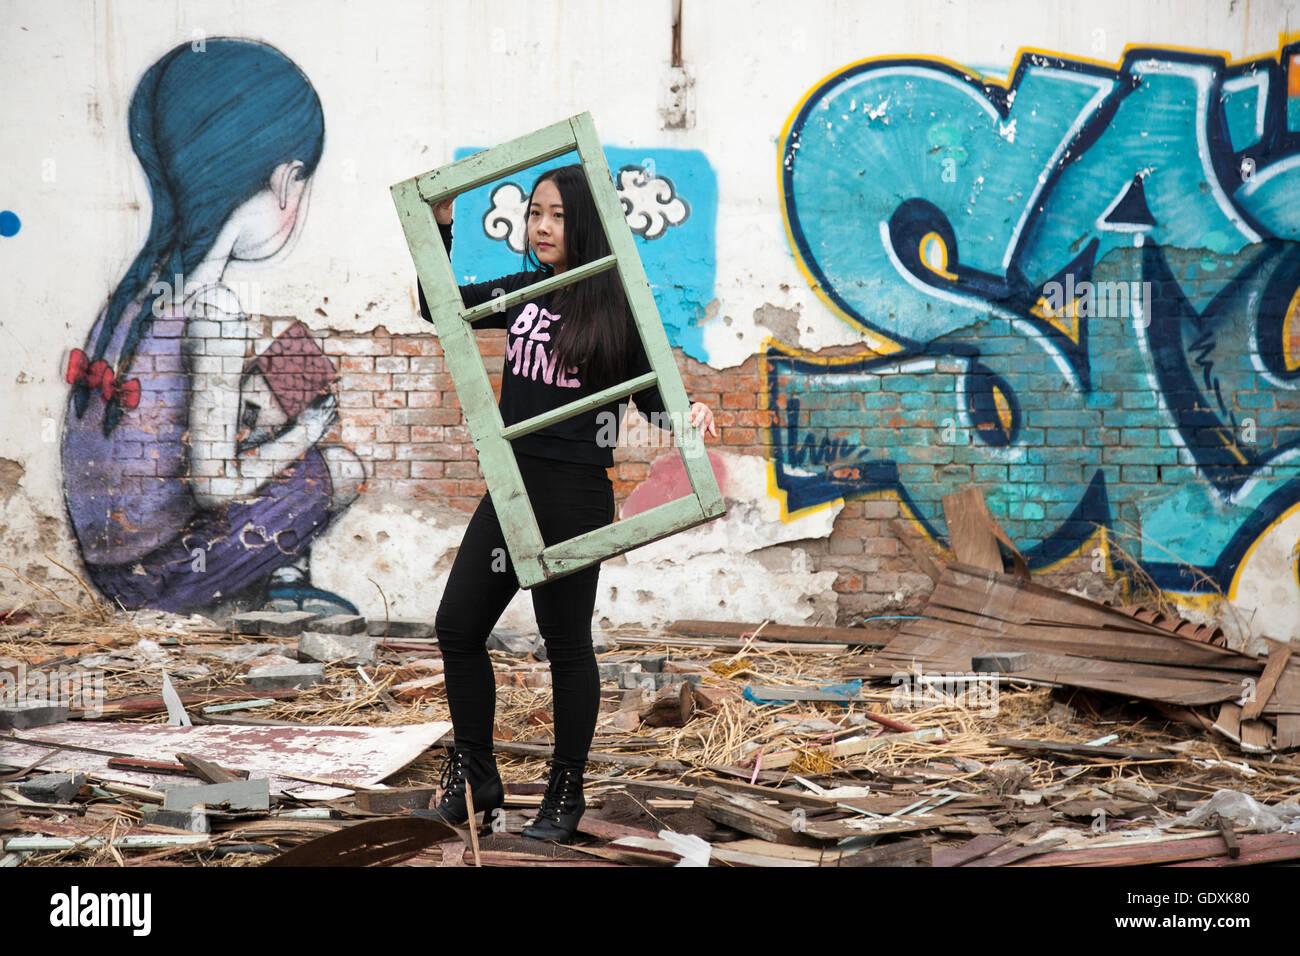 Street-Art an Wänden des abgerissenen Gebäudes. Stockbild